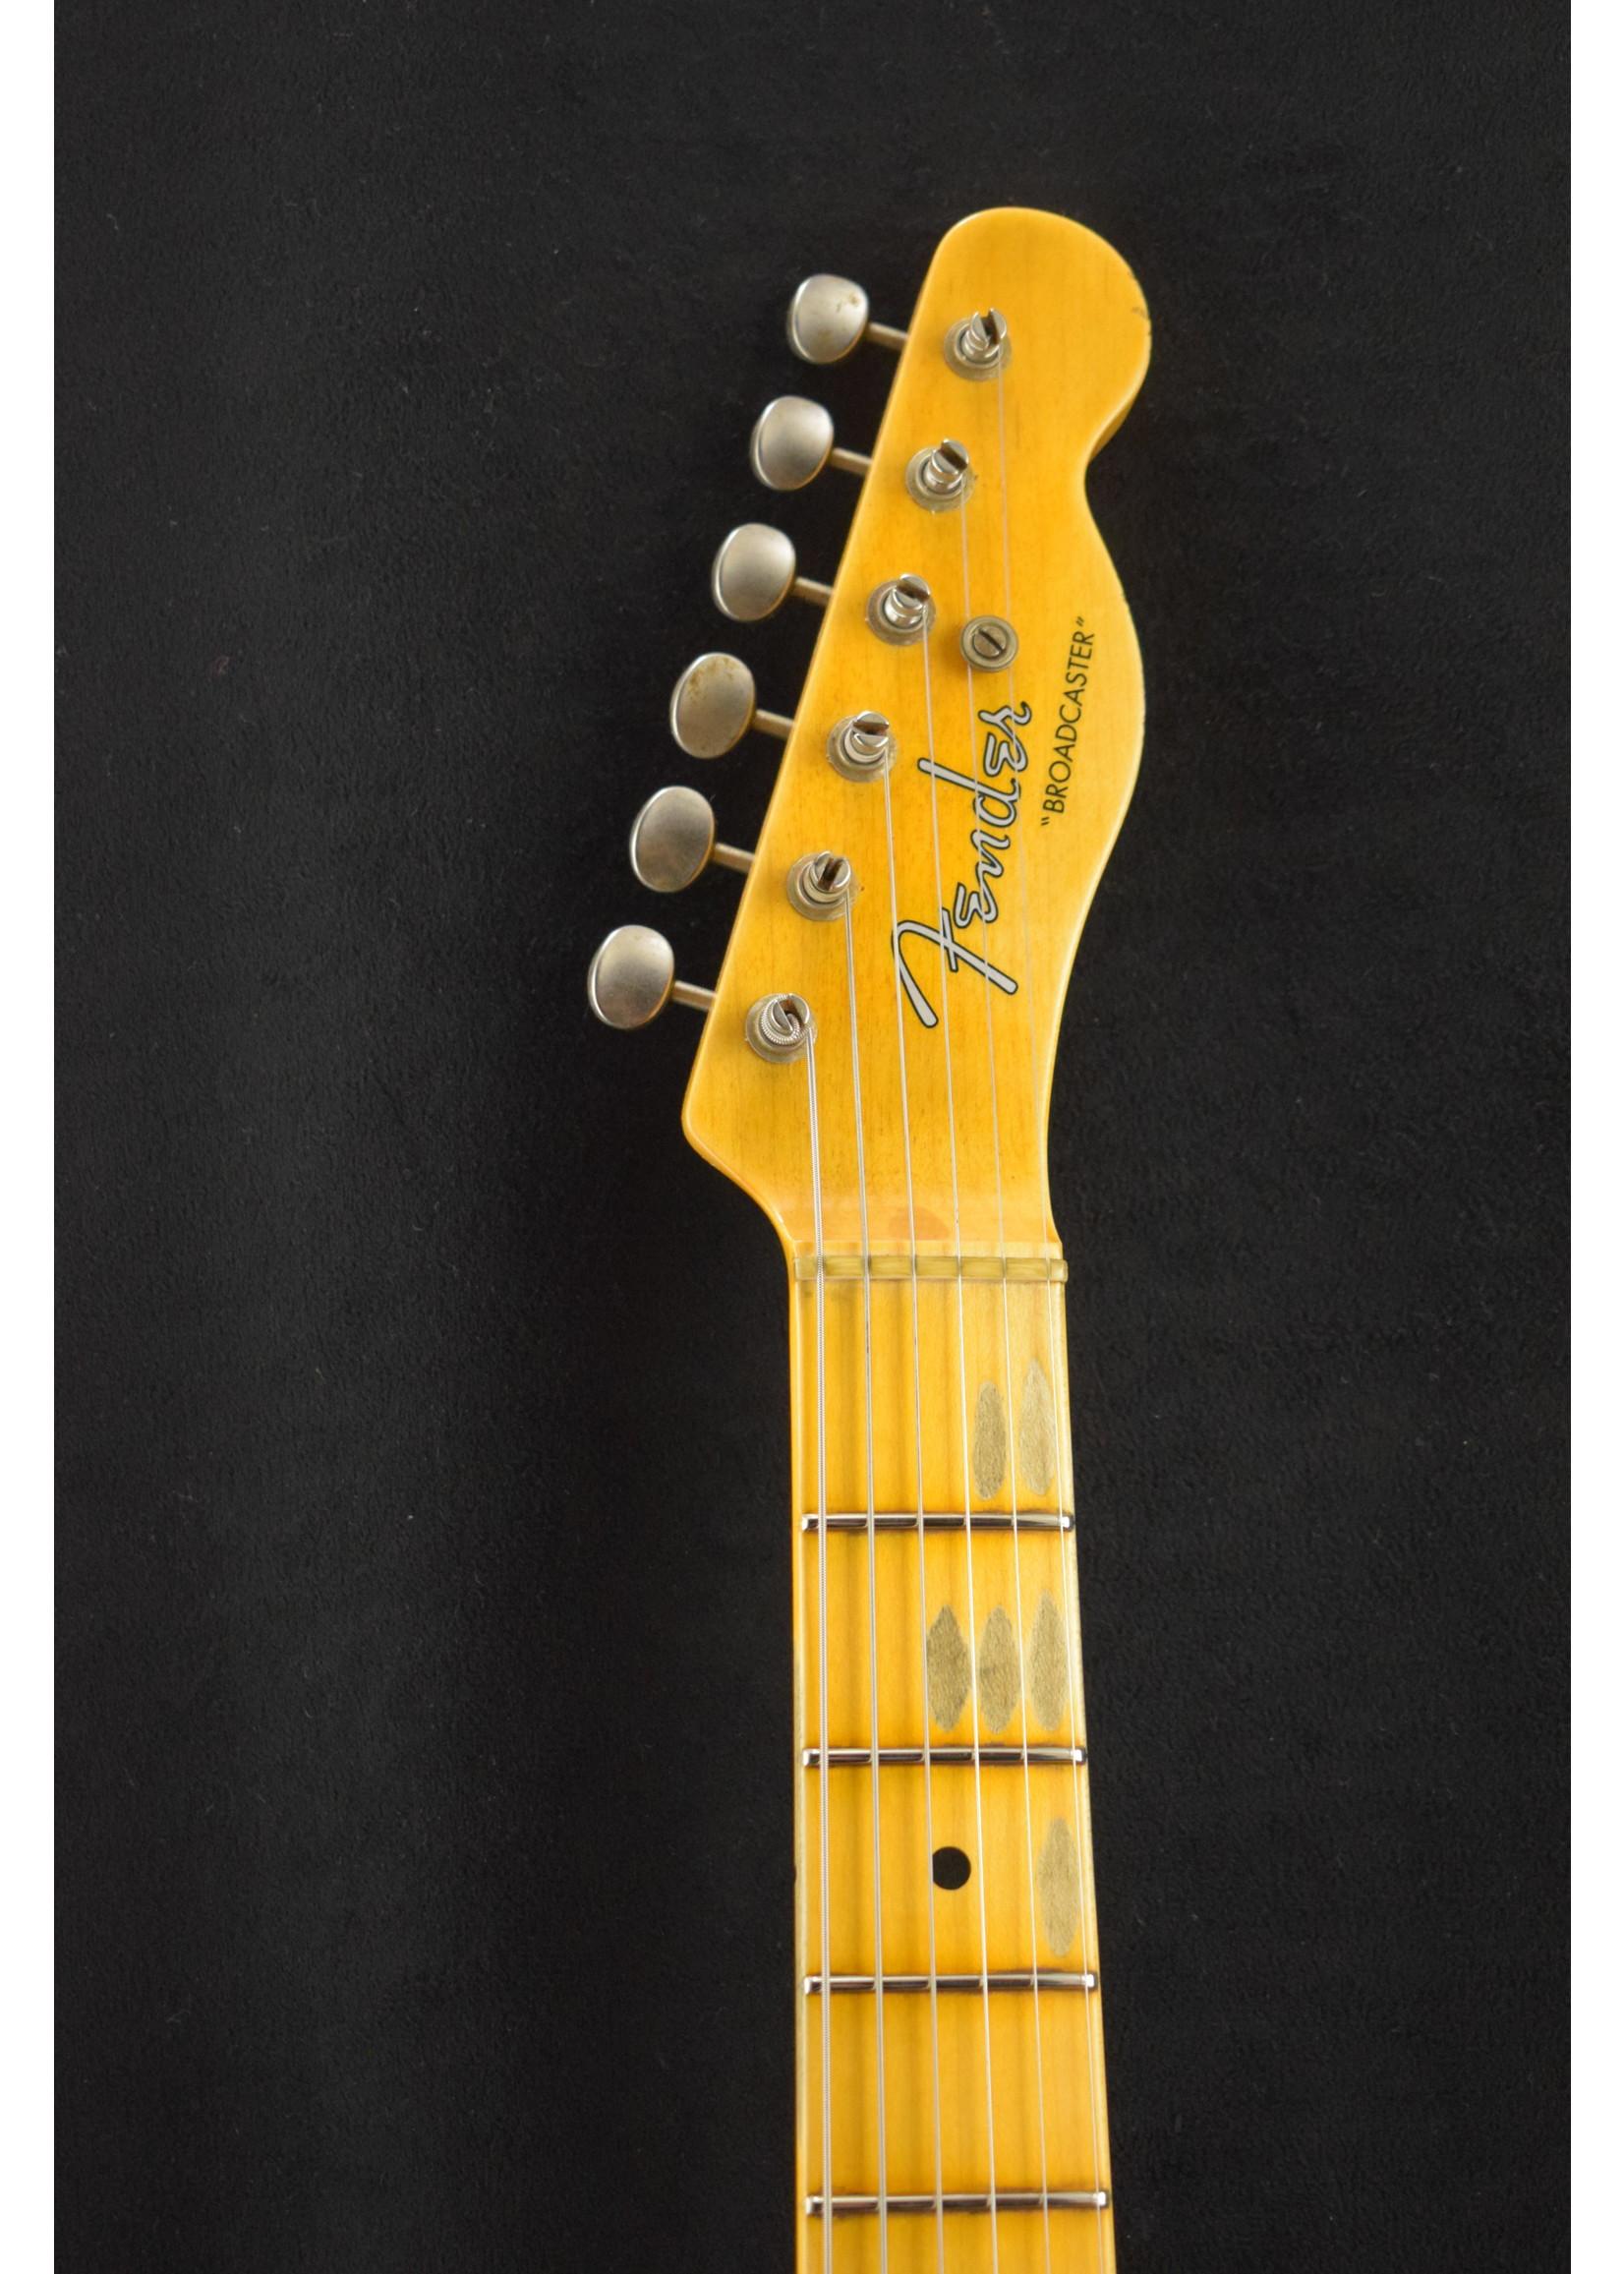 Fender Fender Custom Shop Limited Edition 70th Anniversary Broadcaster Journeyman Relic Nocaster